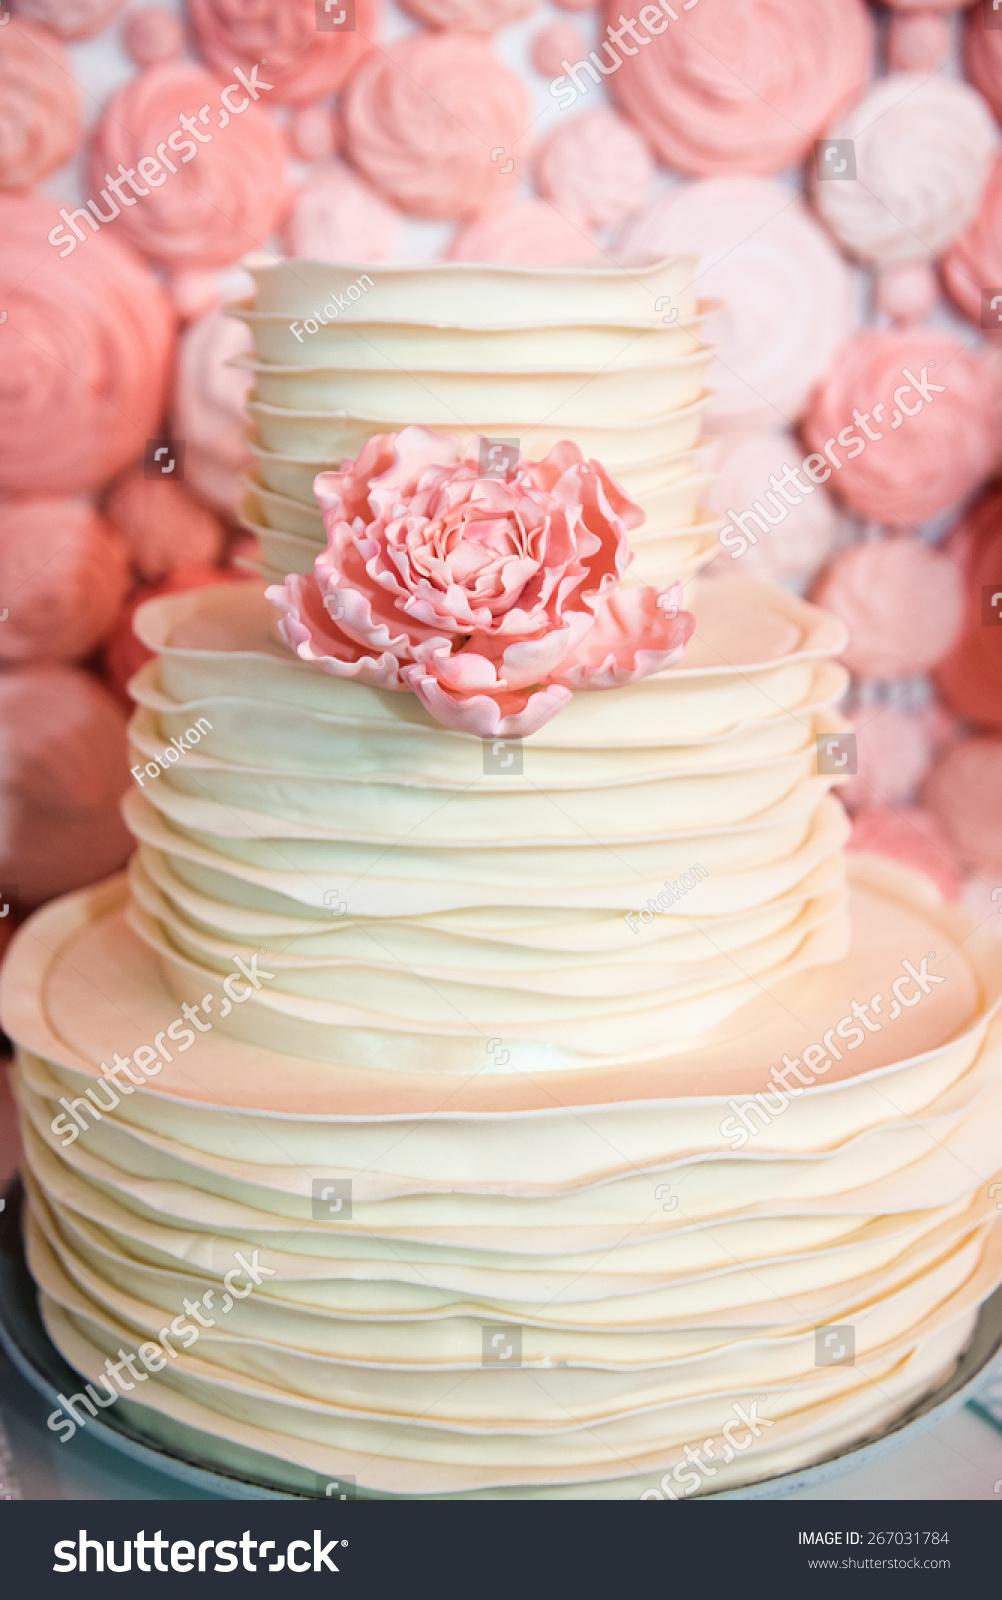 White Wedding Cake Signle Eatable Pink Stock Photo (Royalty Free ...